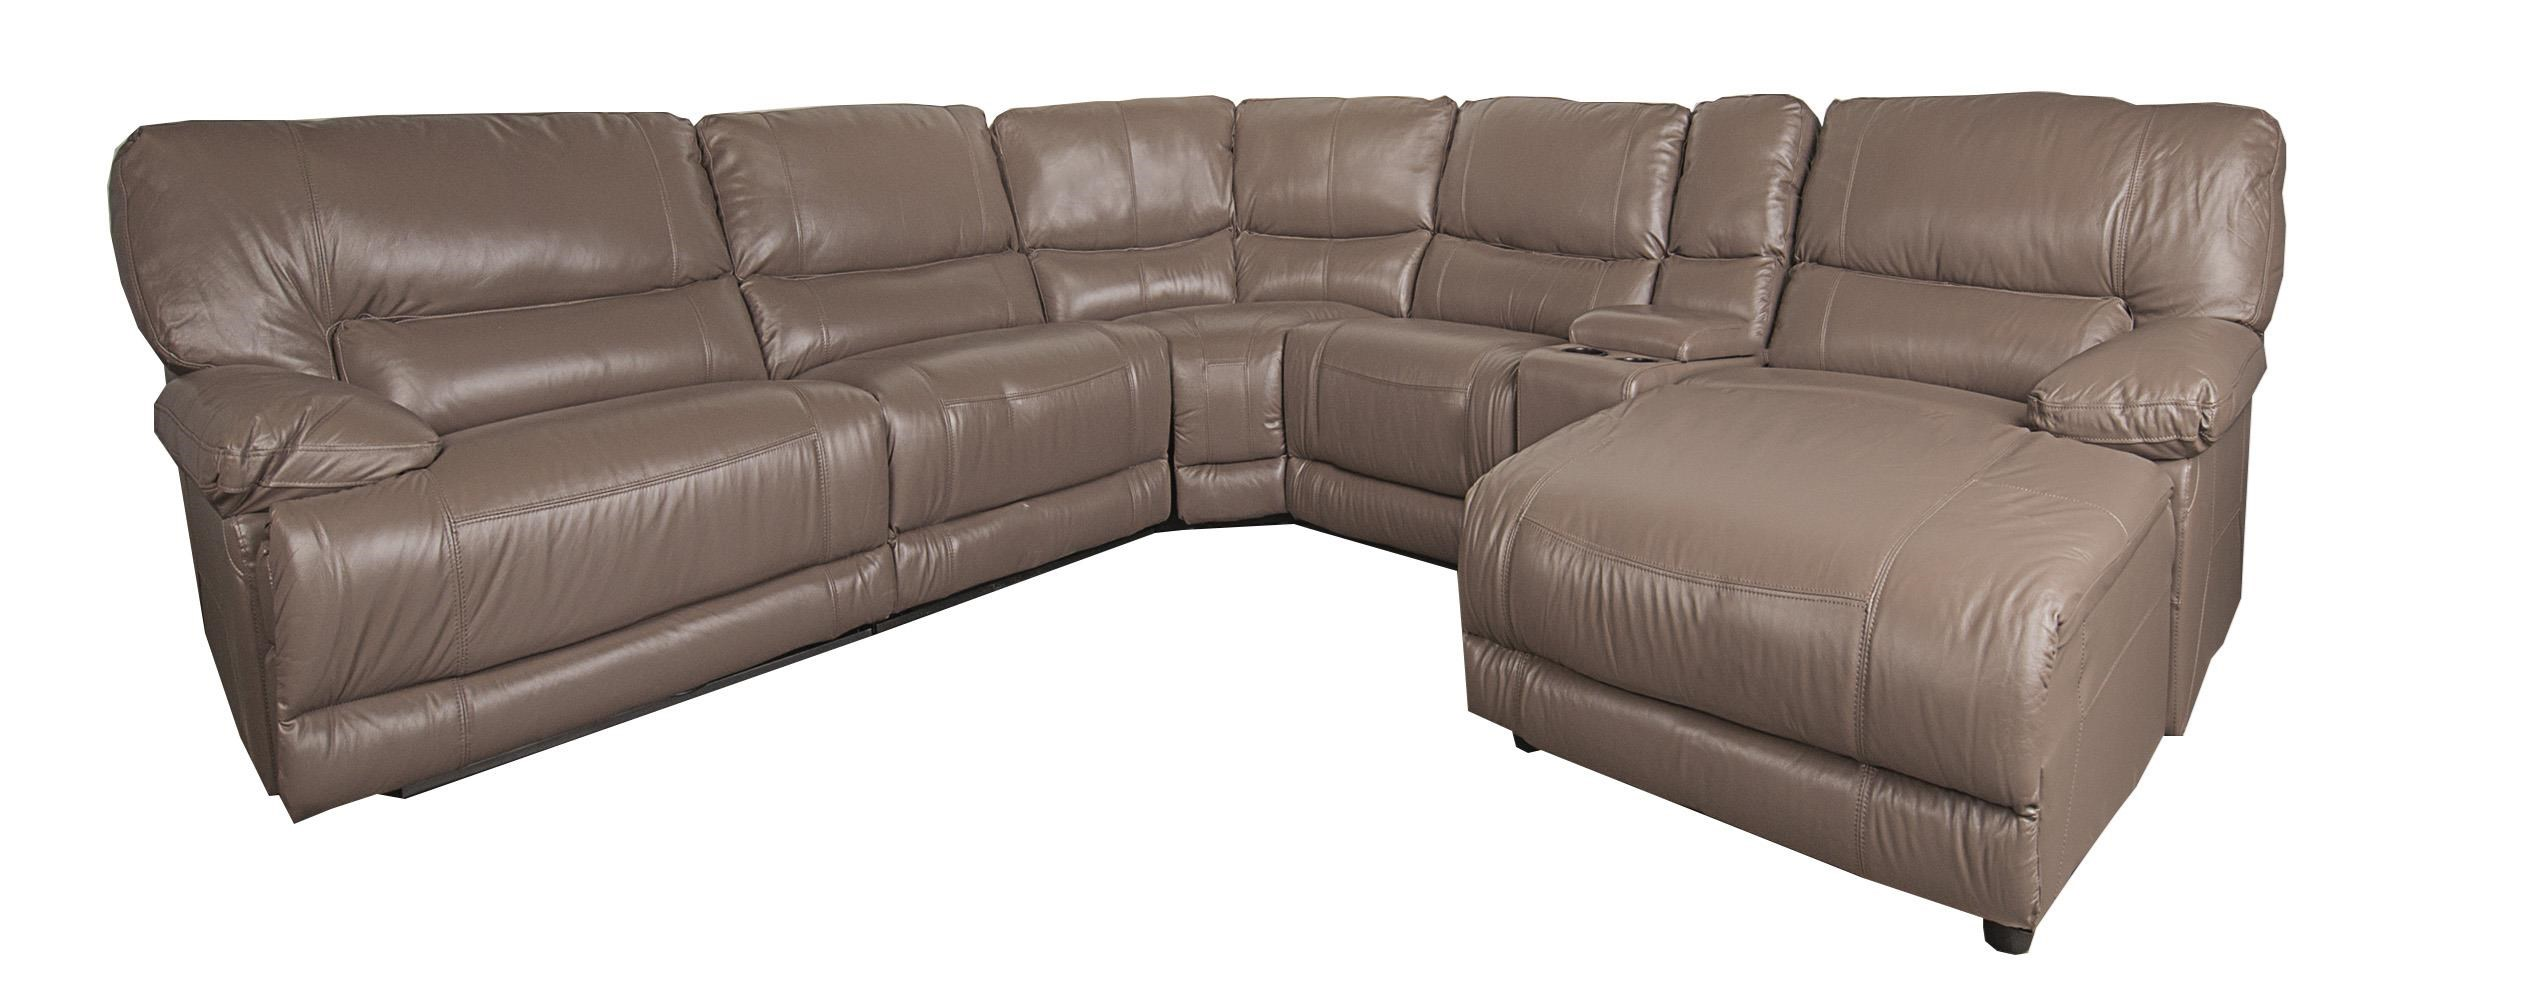 Morris Home Baylor Baylor 6-Piece Leather-Match* PWR Reclining - Item Number: 134129263